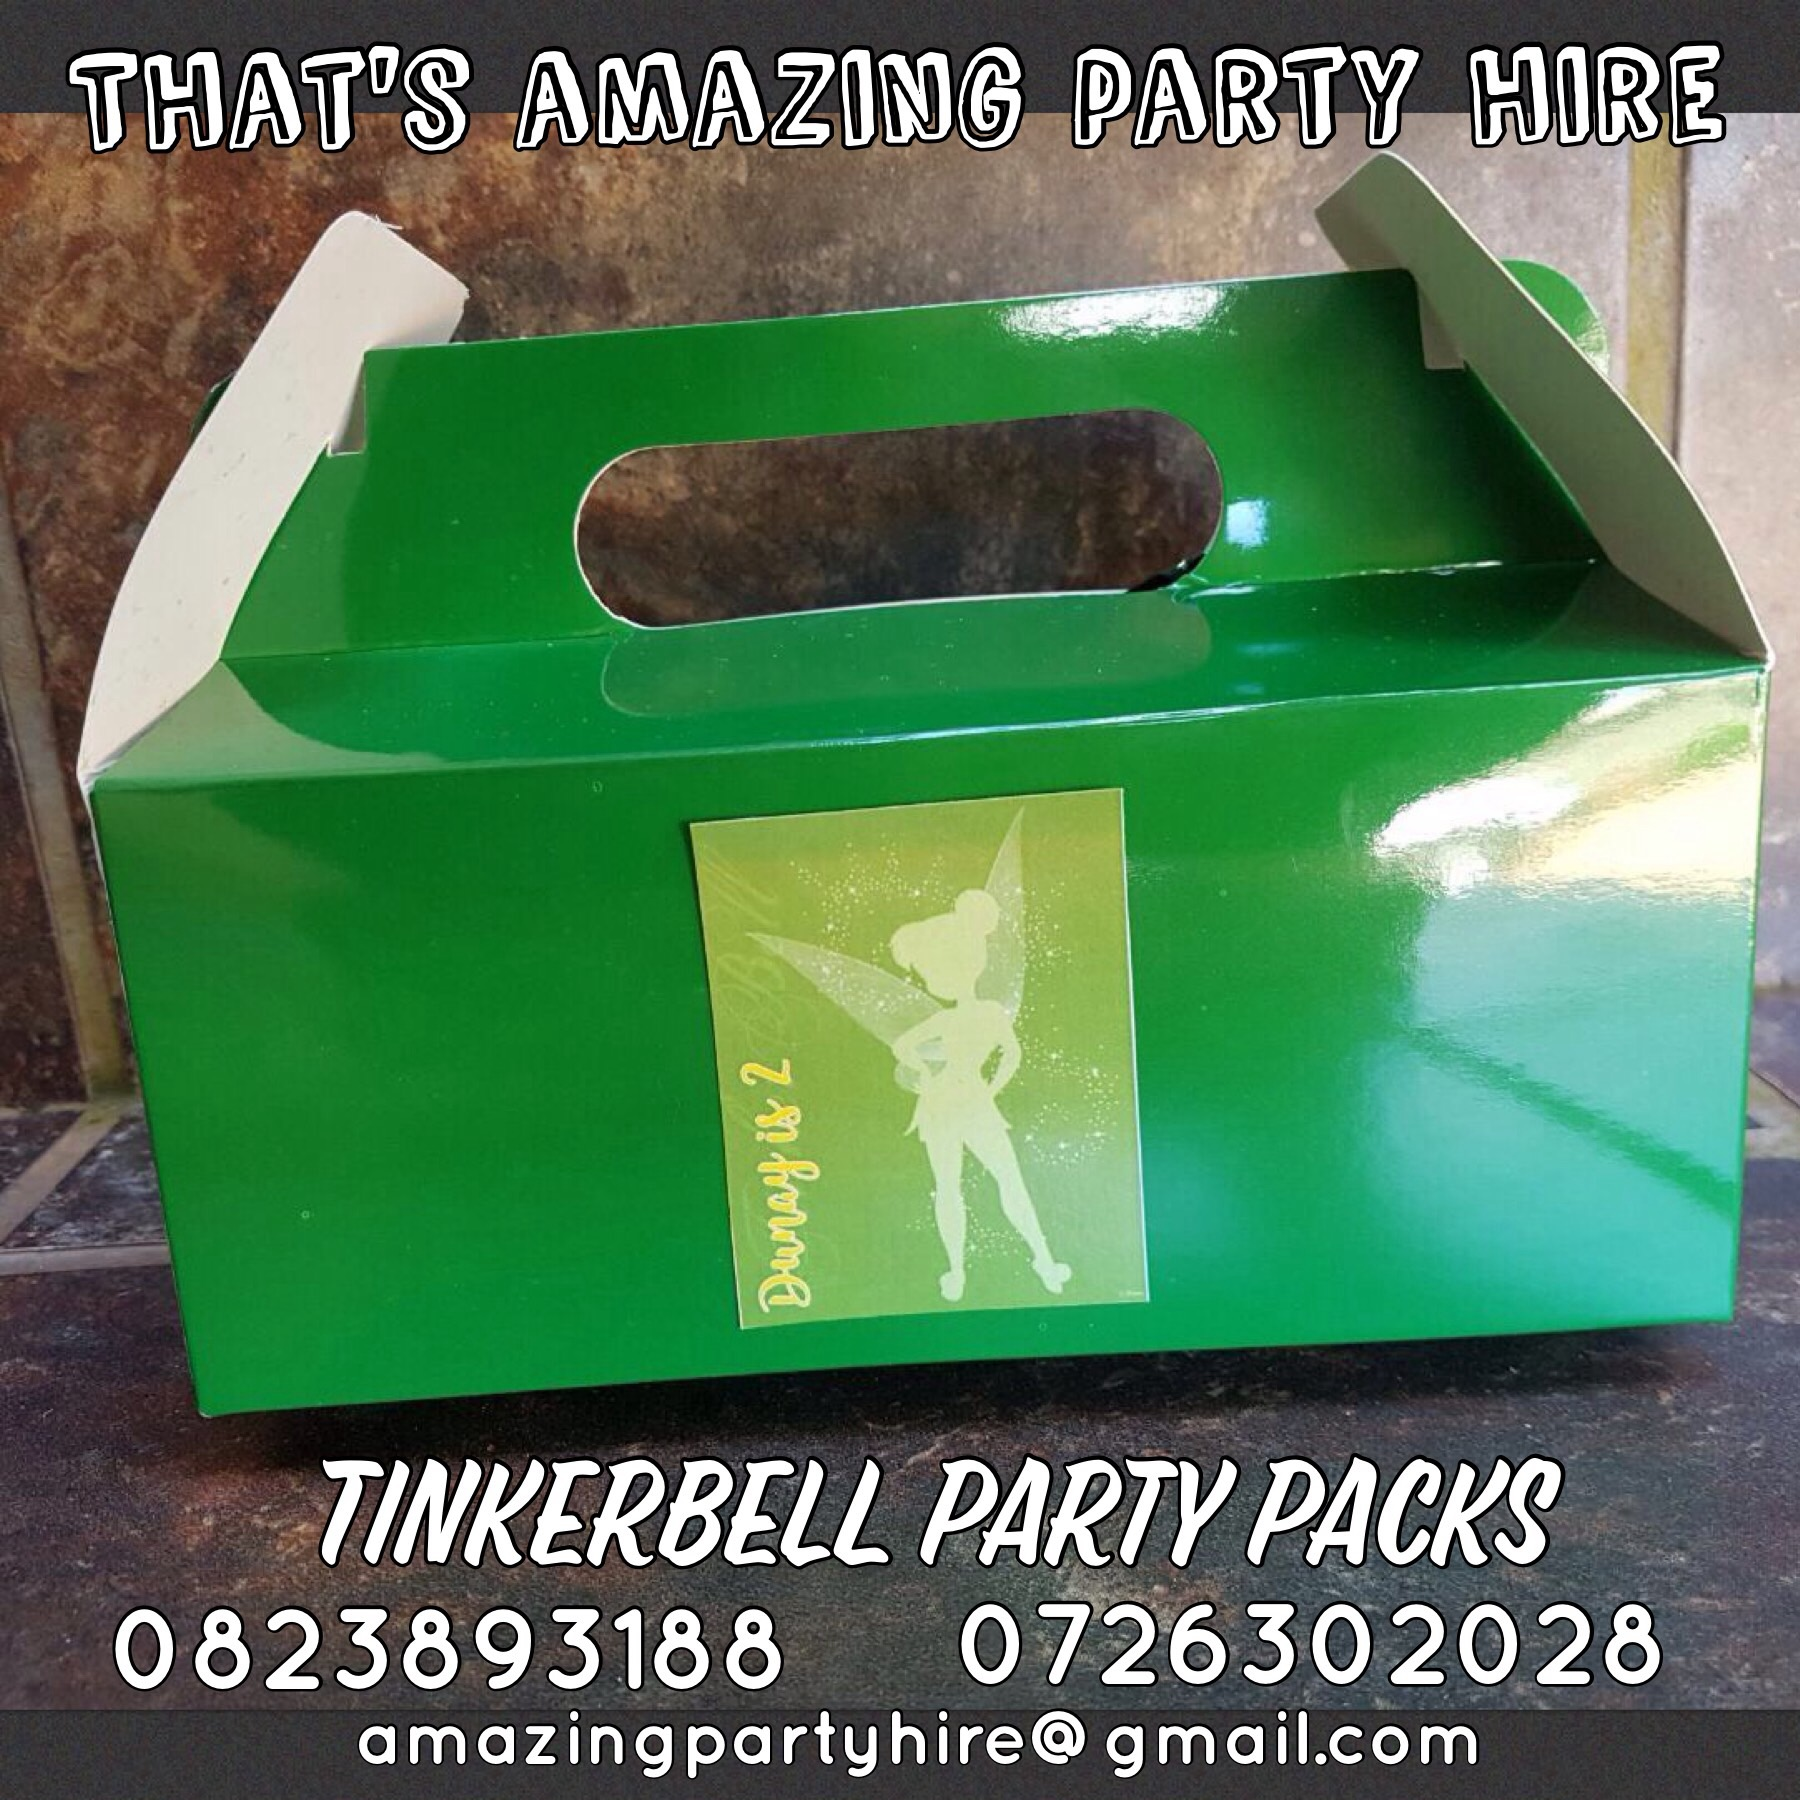 Tinkerbel